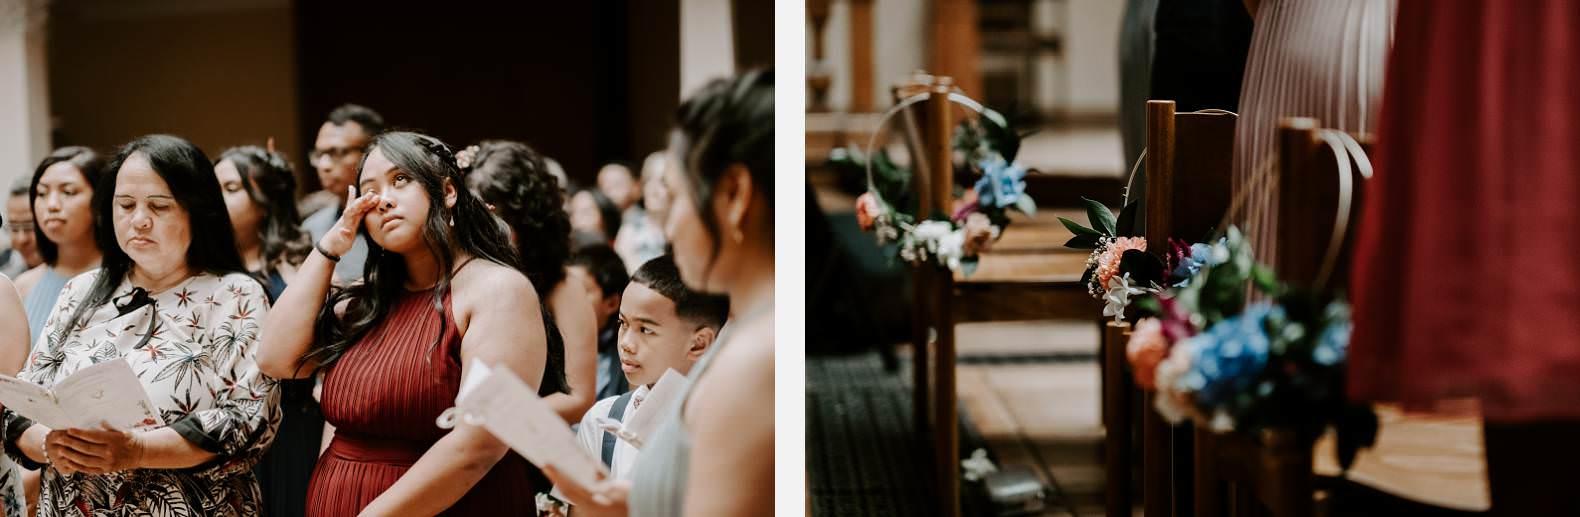 mariage manoir de corny photographe bel esprit 0023 1